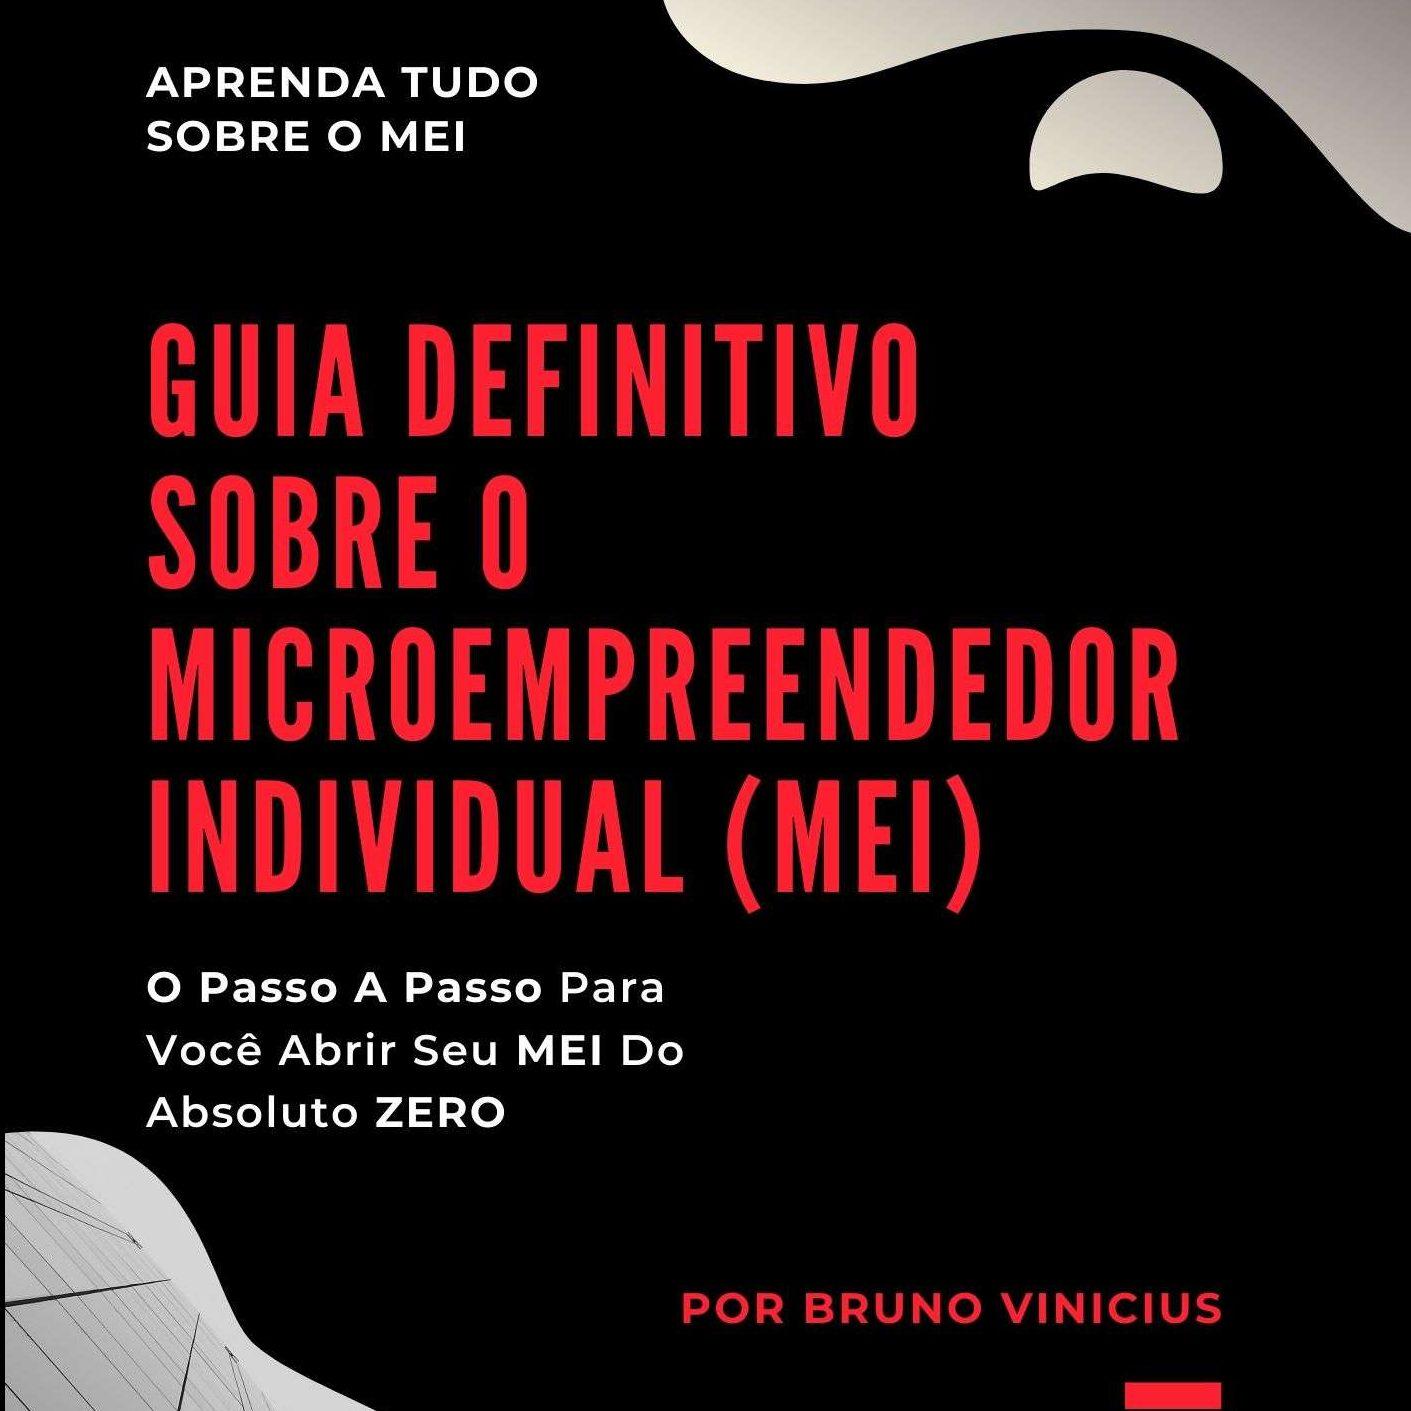 Guia Definitivo Sobre o Microempreendedor Individual – MEI